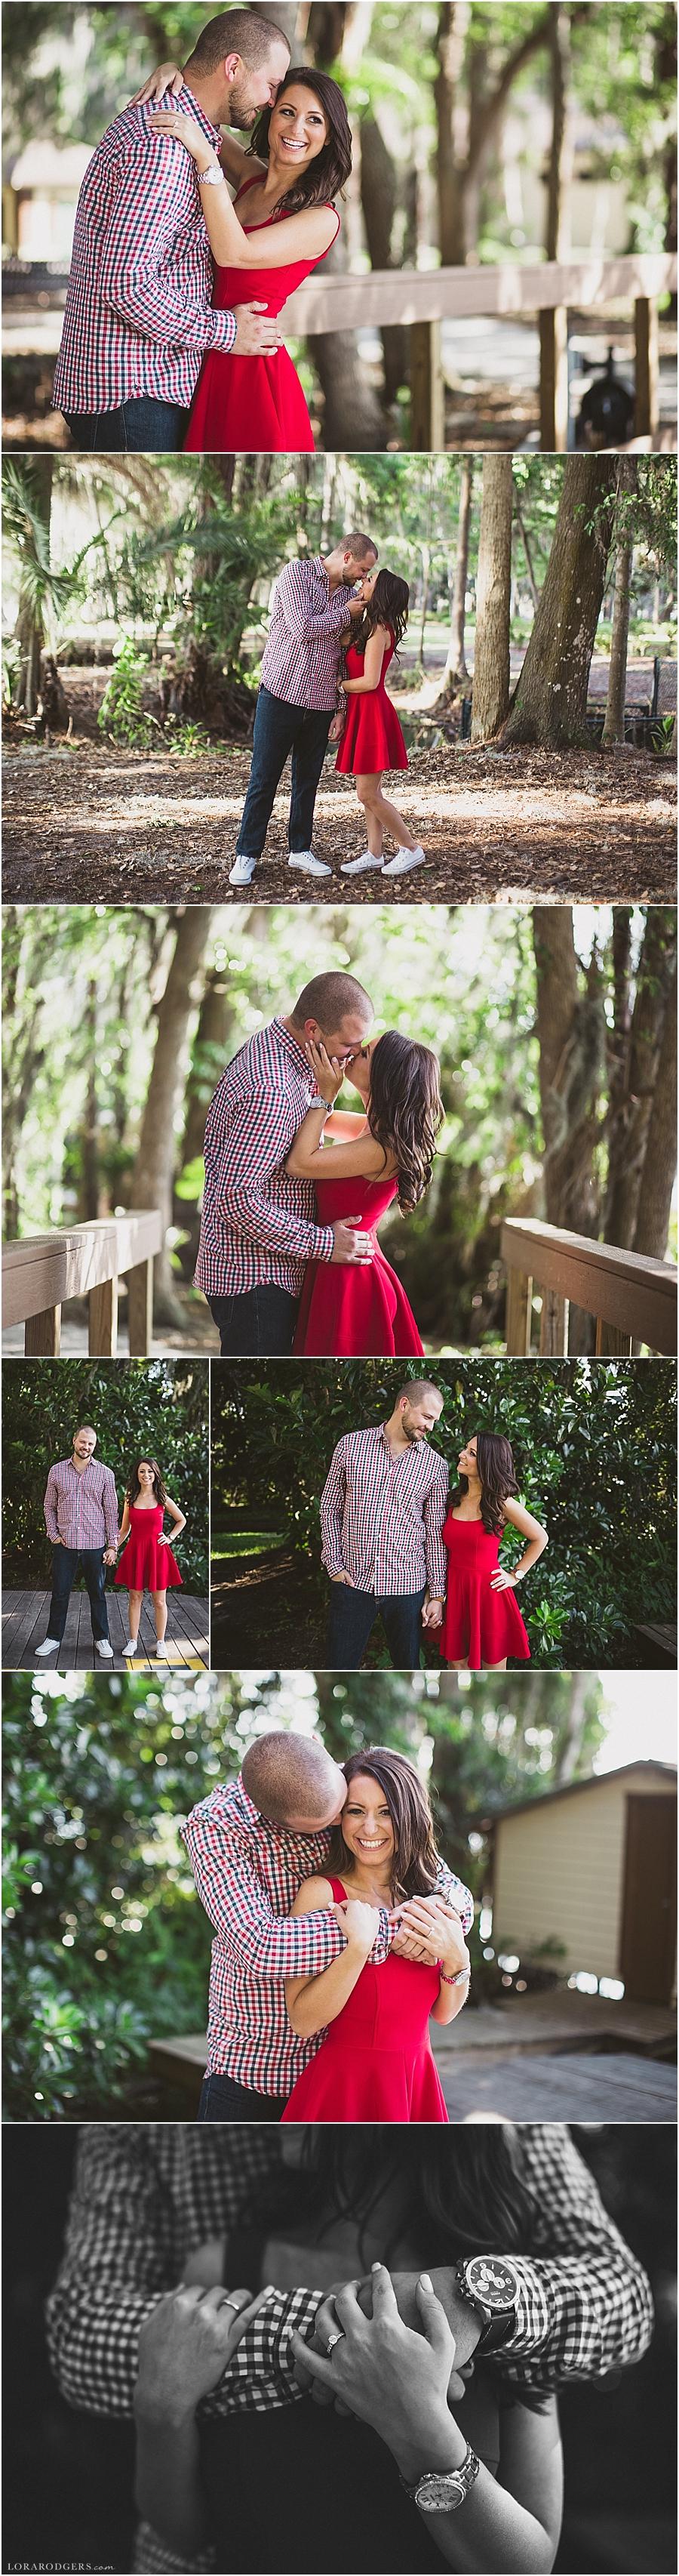 Kraft_Azalea_Engagement_Winter_Park_Florida_001